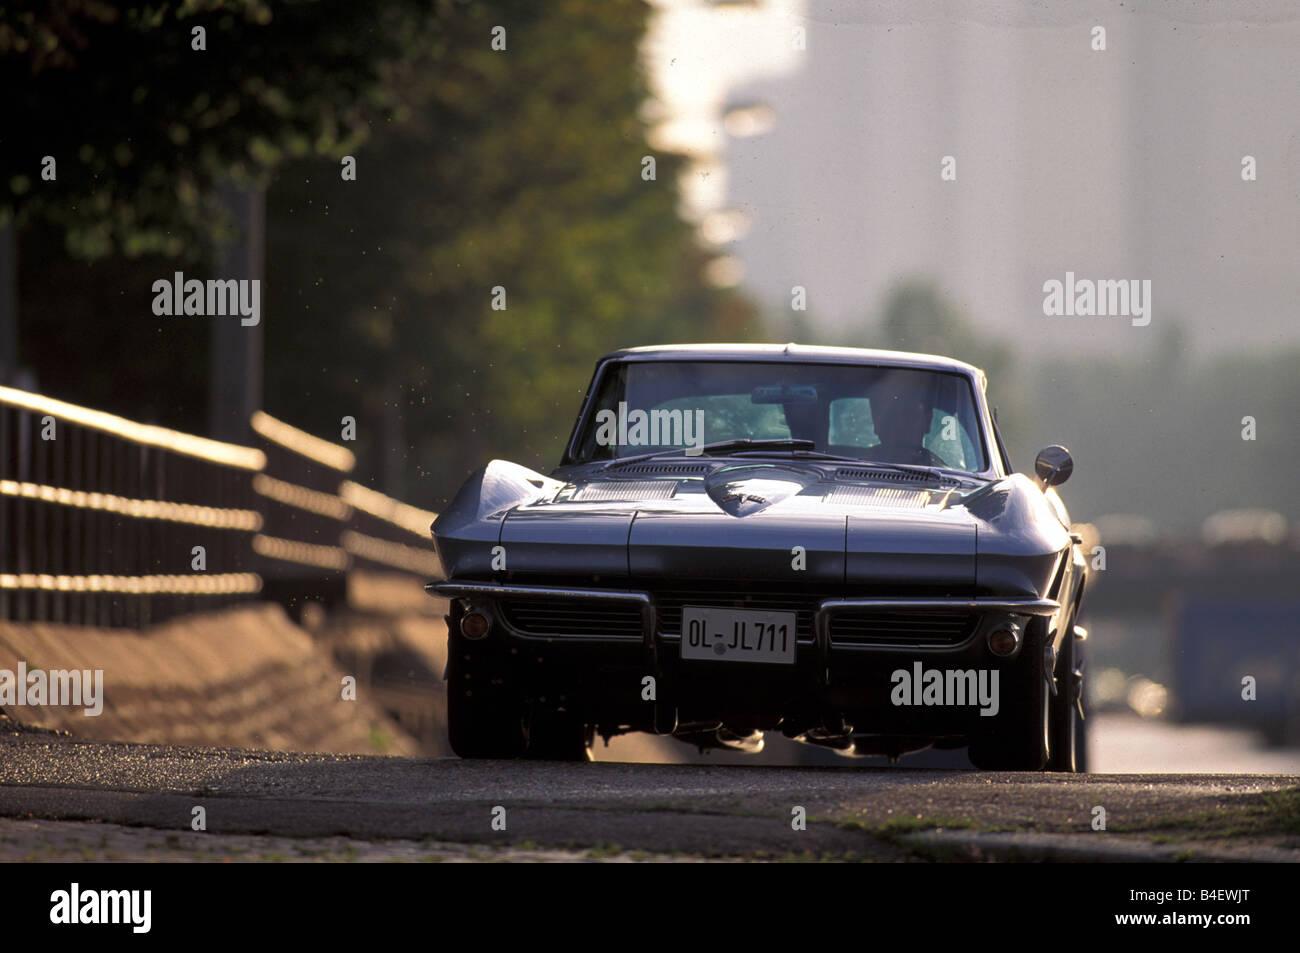 Chevrolet Corvette Sting Ray, model year 1963 - Stock Image